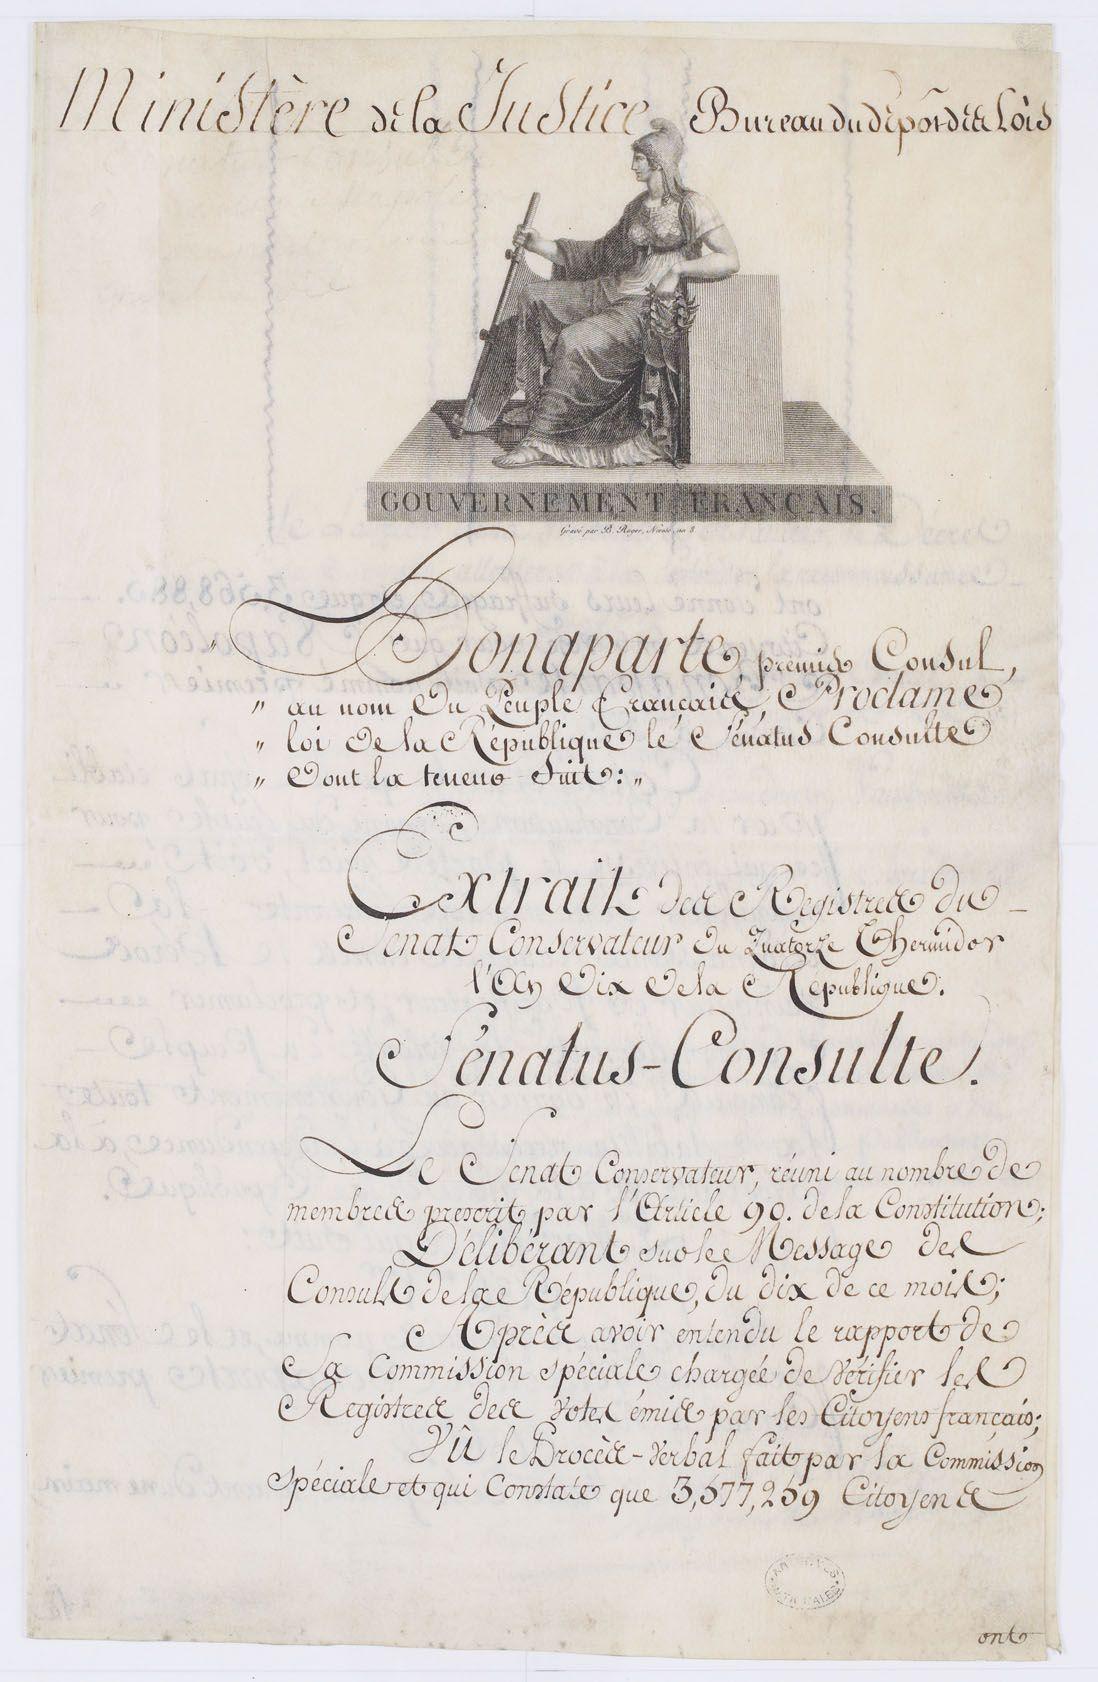 Le Sénatusconsulte du 15 thermidor an X (3 août 1802